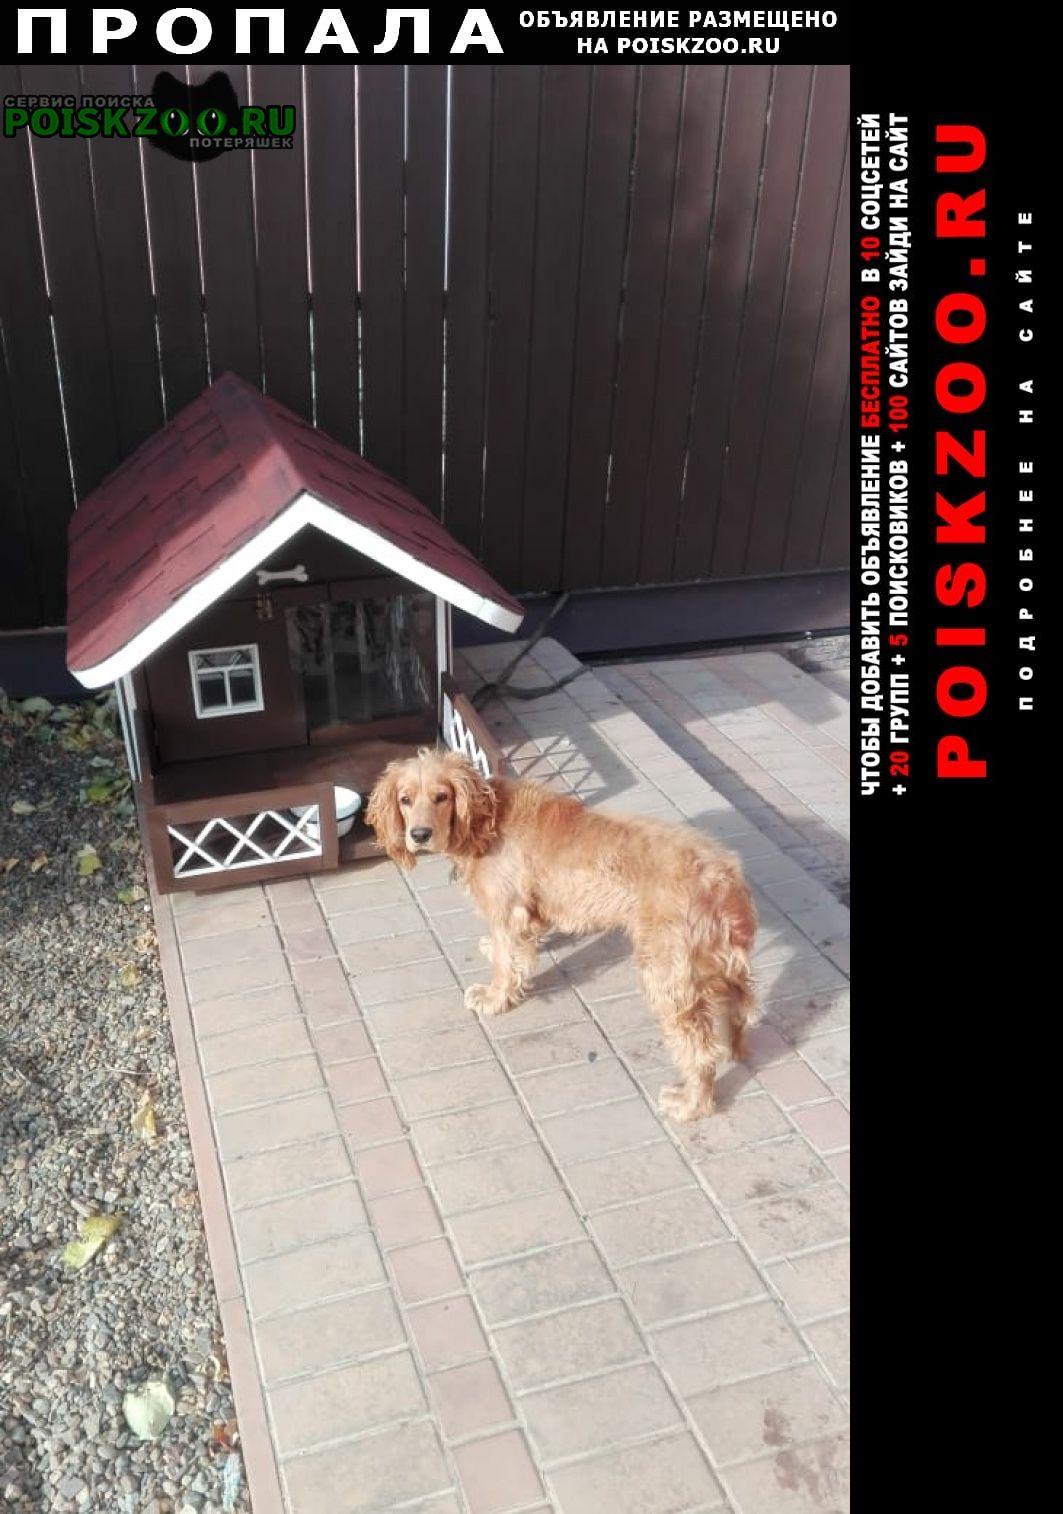 Пропала собака кобель кличка чапик Оренбург